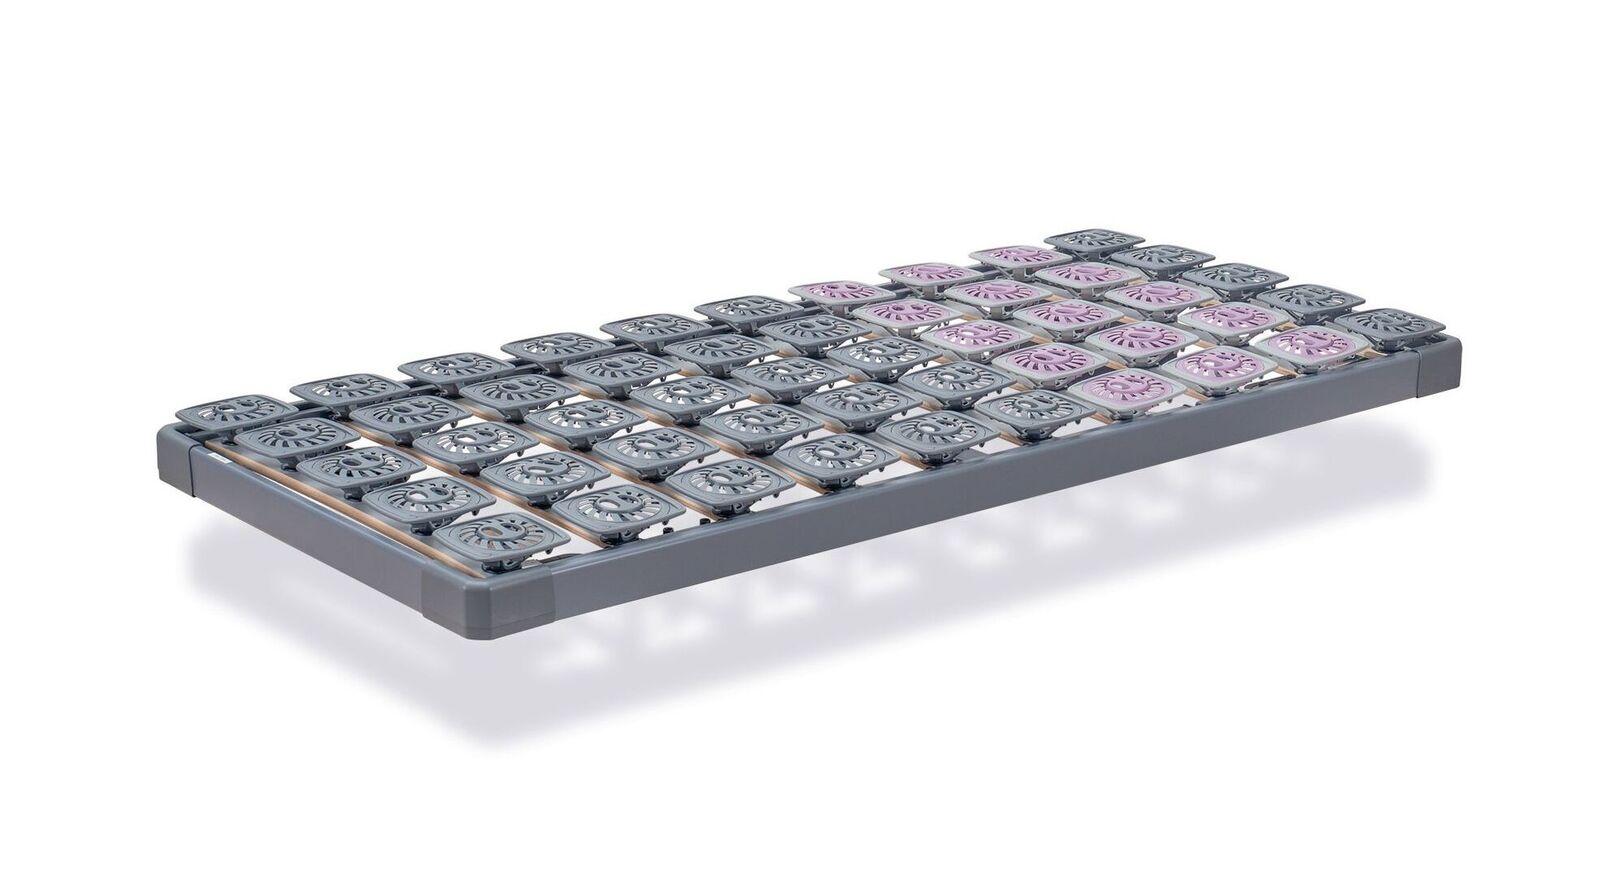 Hochwertiger TEMPUR Lattenrost Premium Flex 500